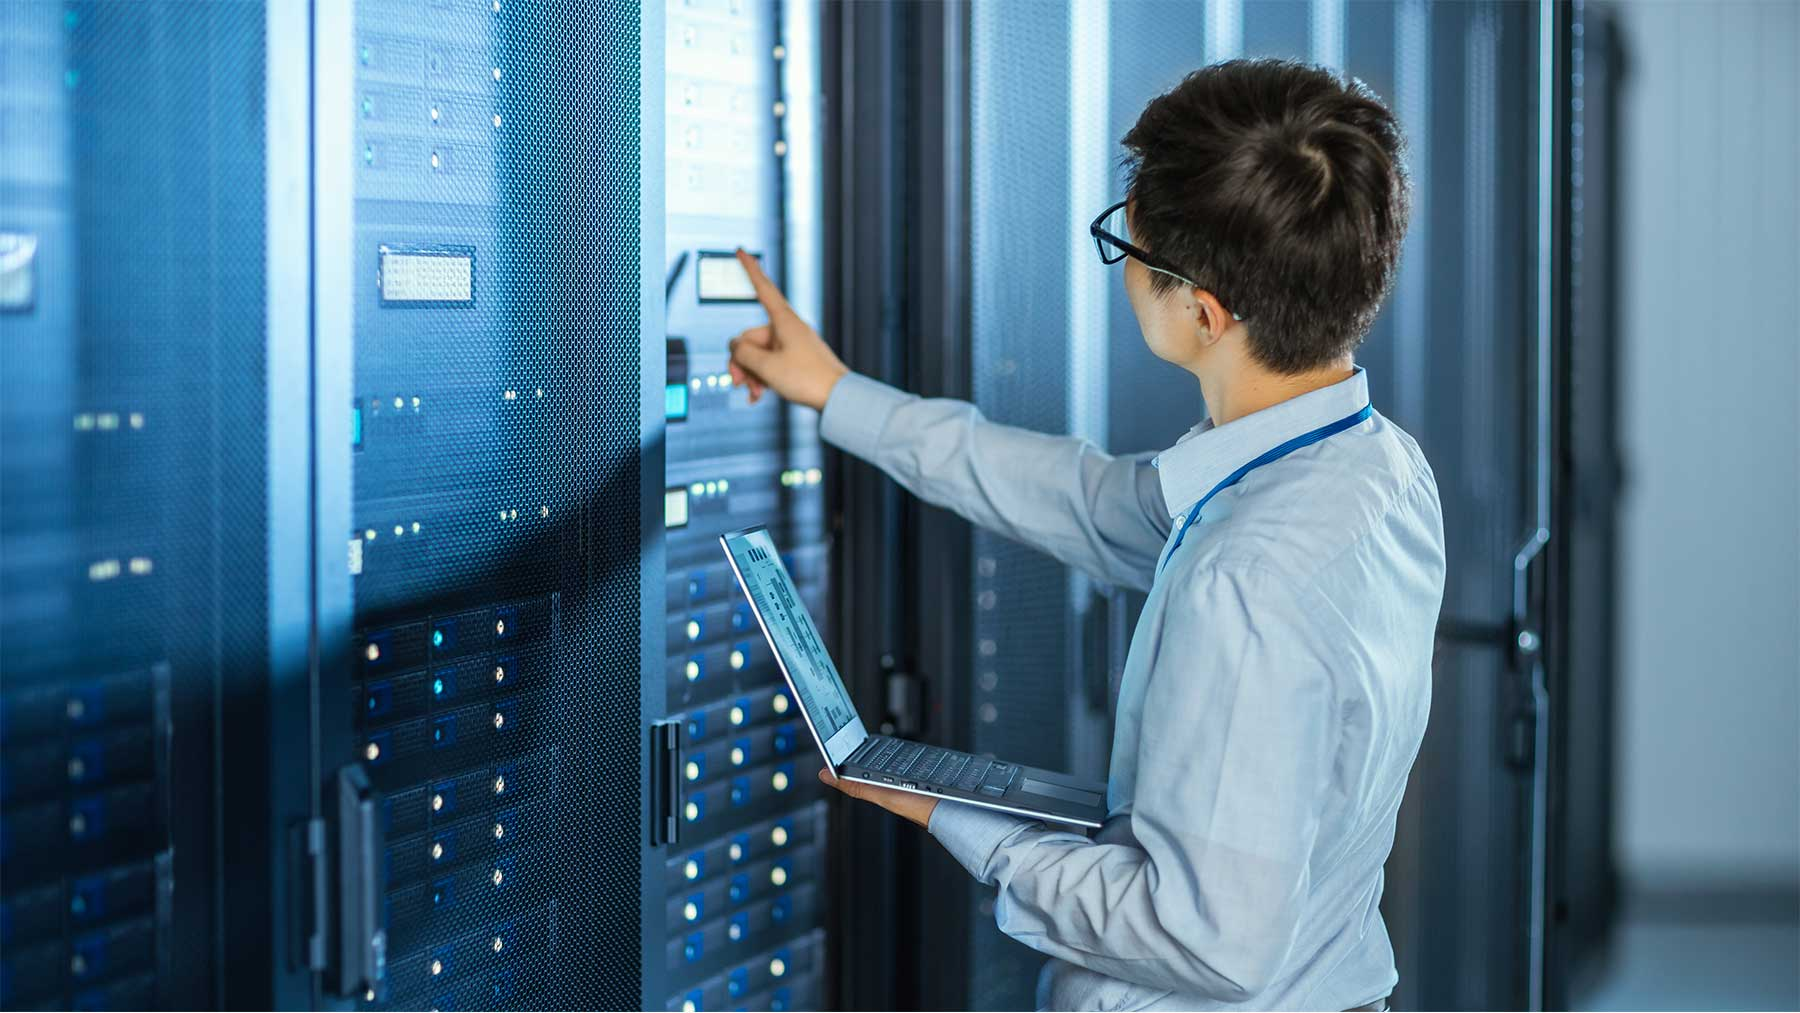 man in a server room monitoring server data